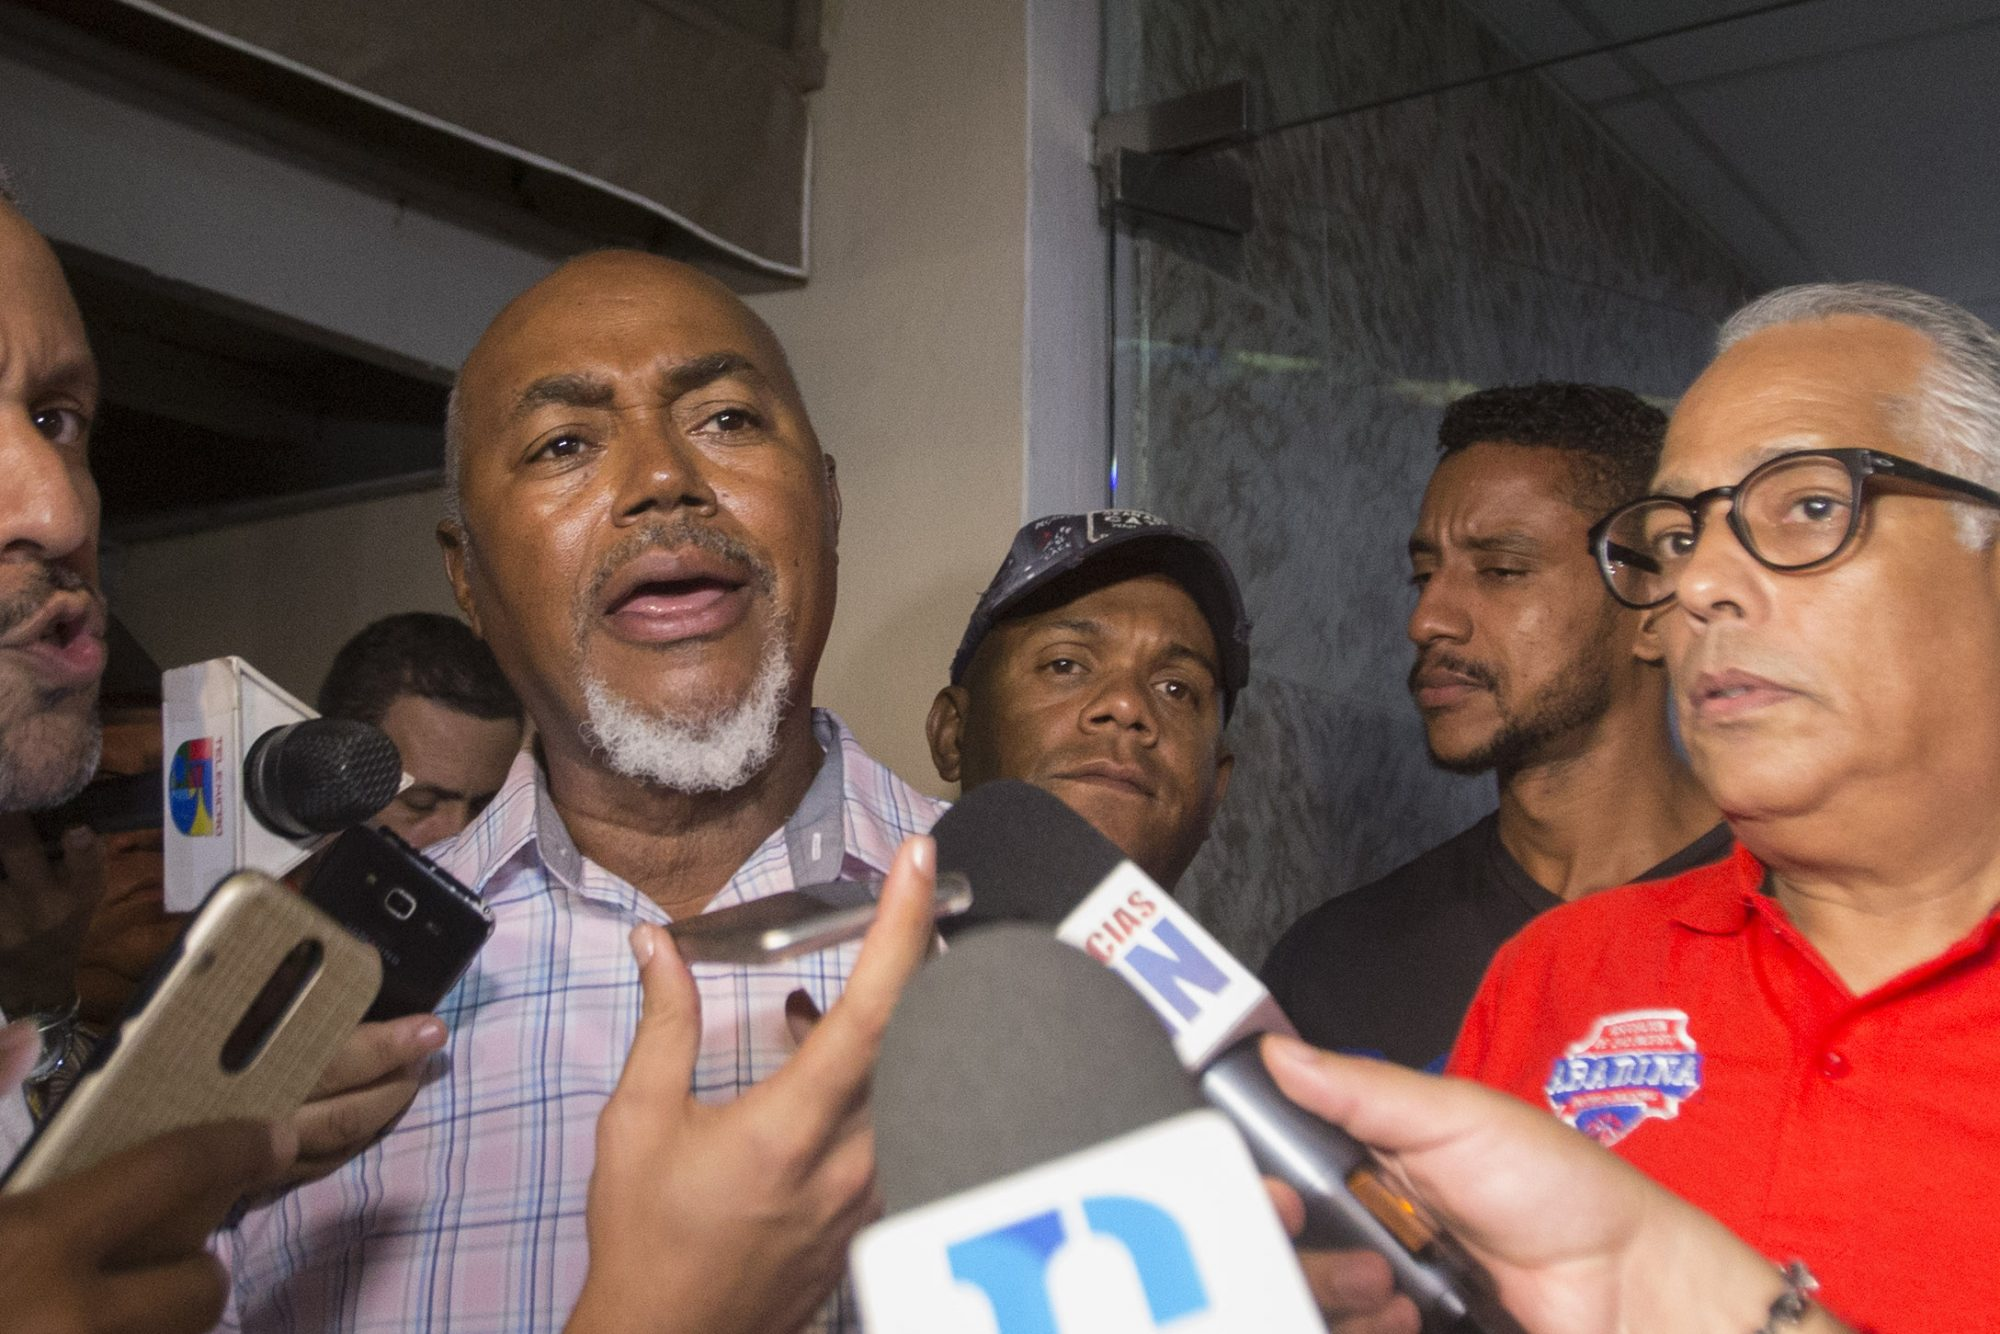 Leo Ortiz padre de David Ortiz, baleado